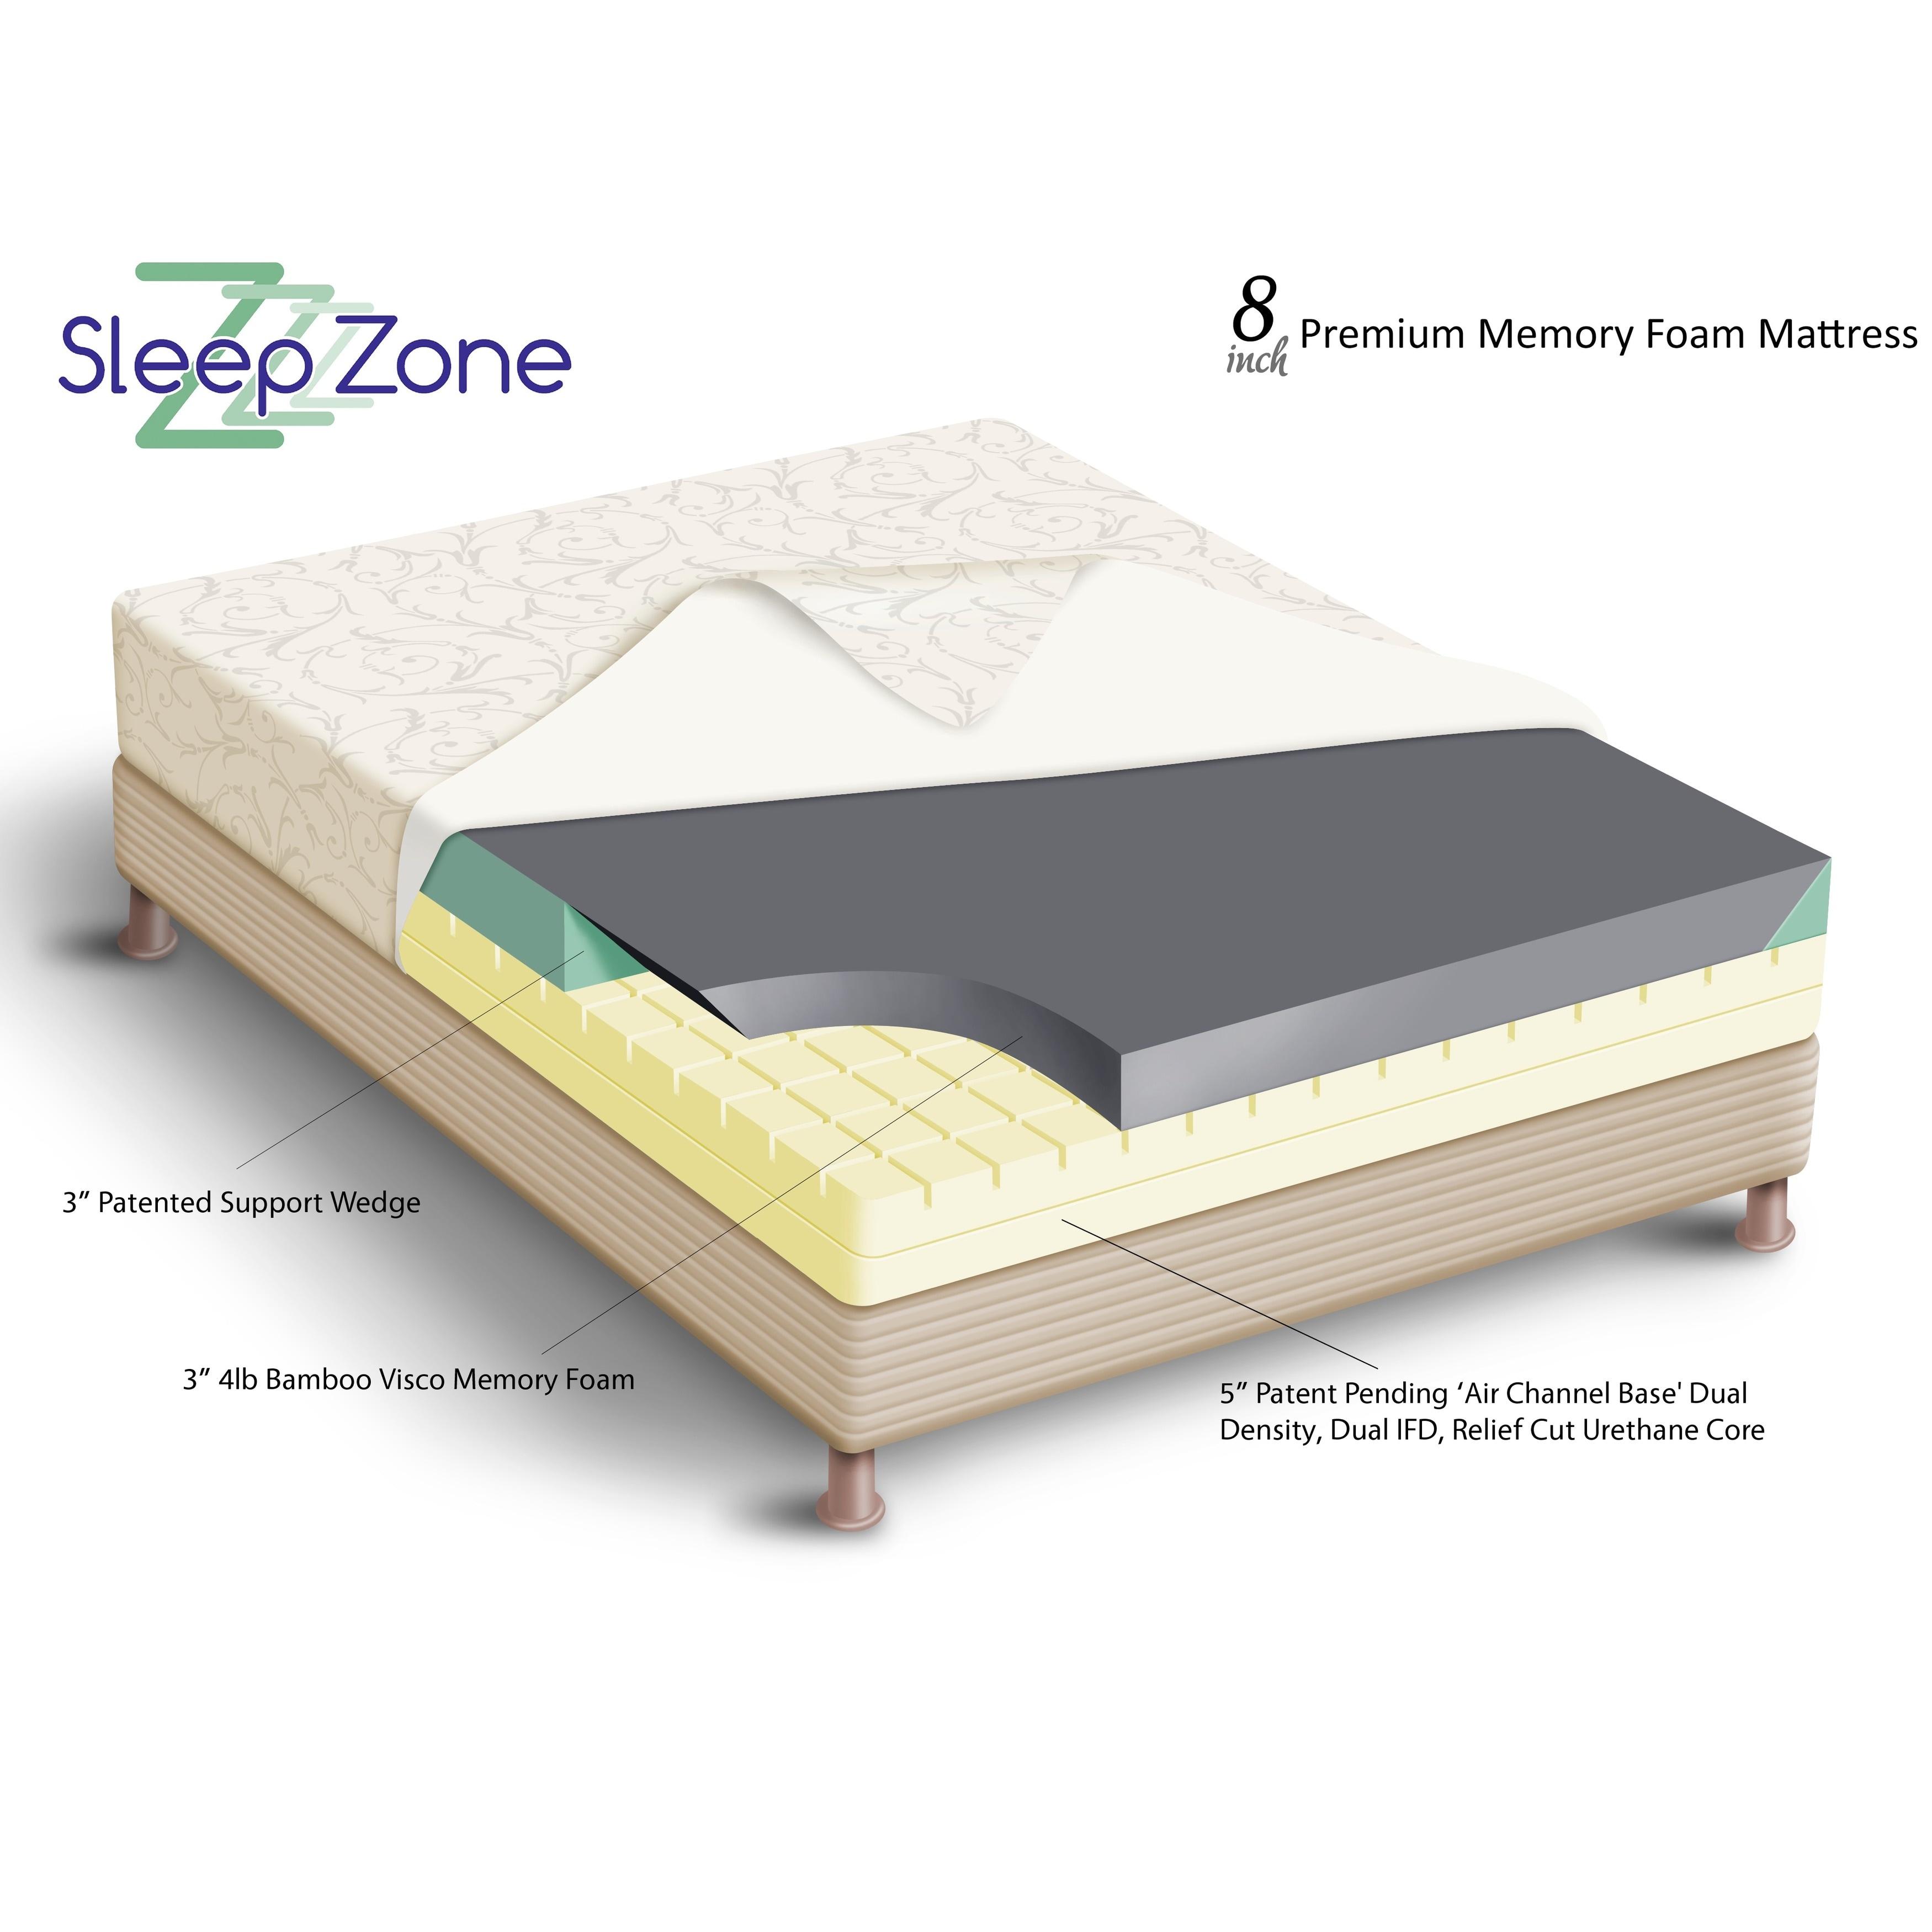 Sleep Zone Premium Adjustable Bed and 8 inch Split King size